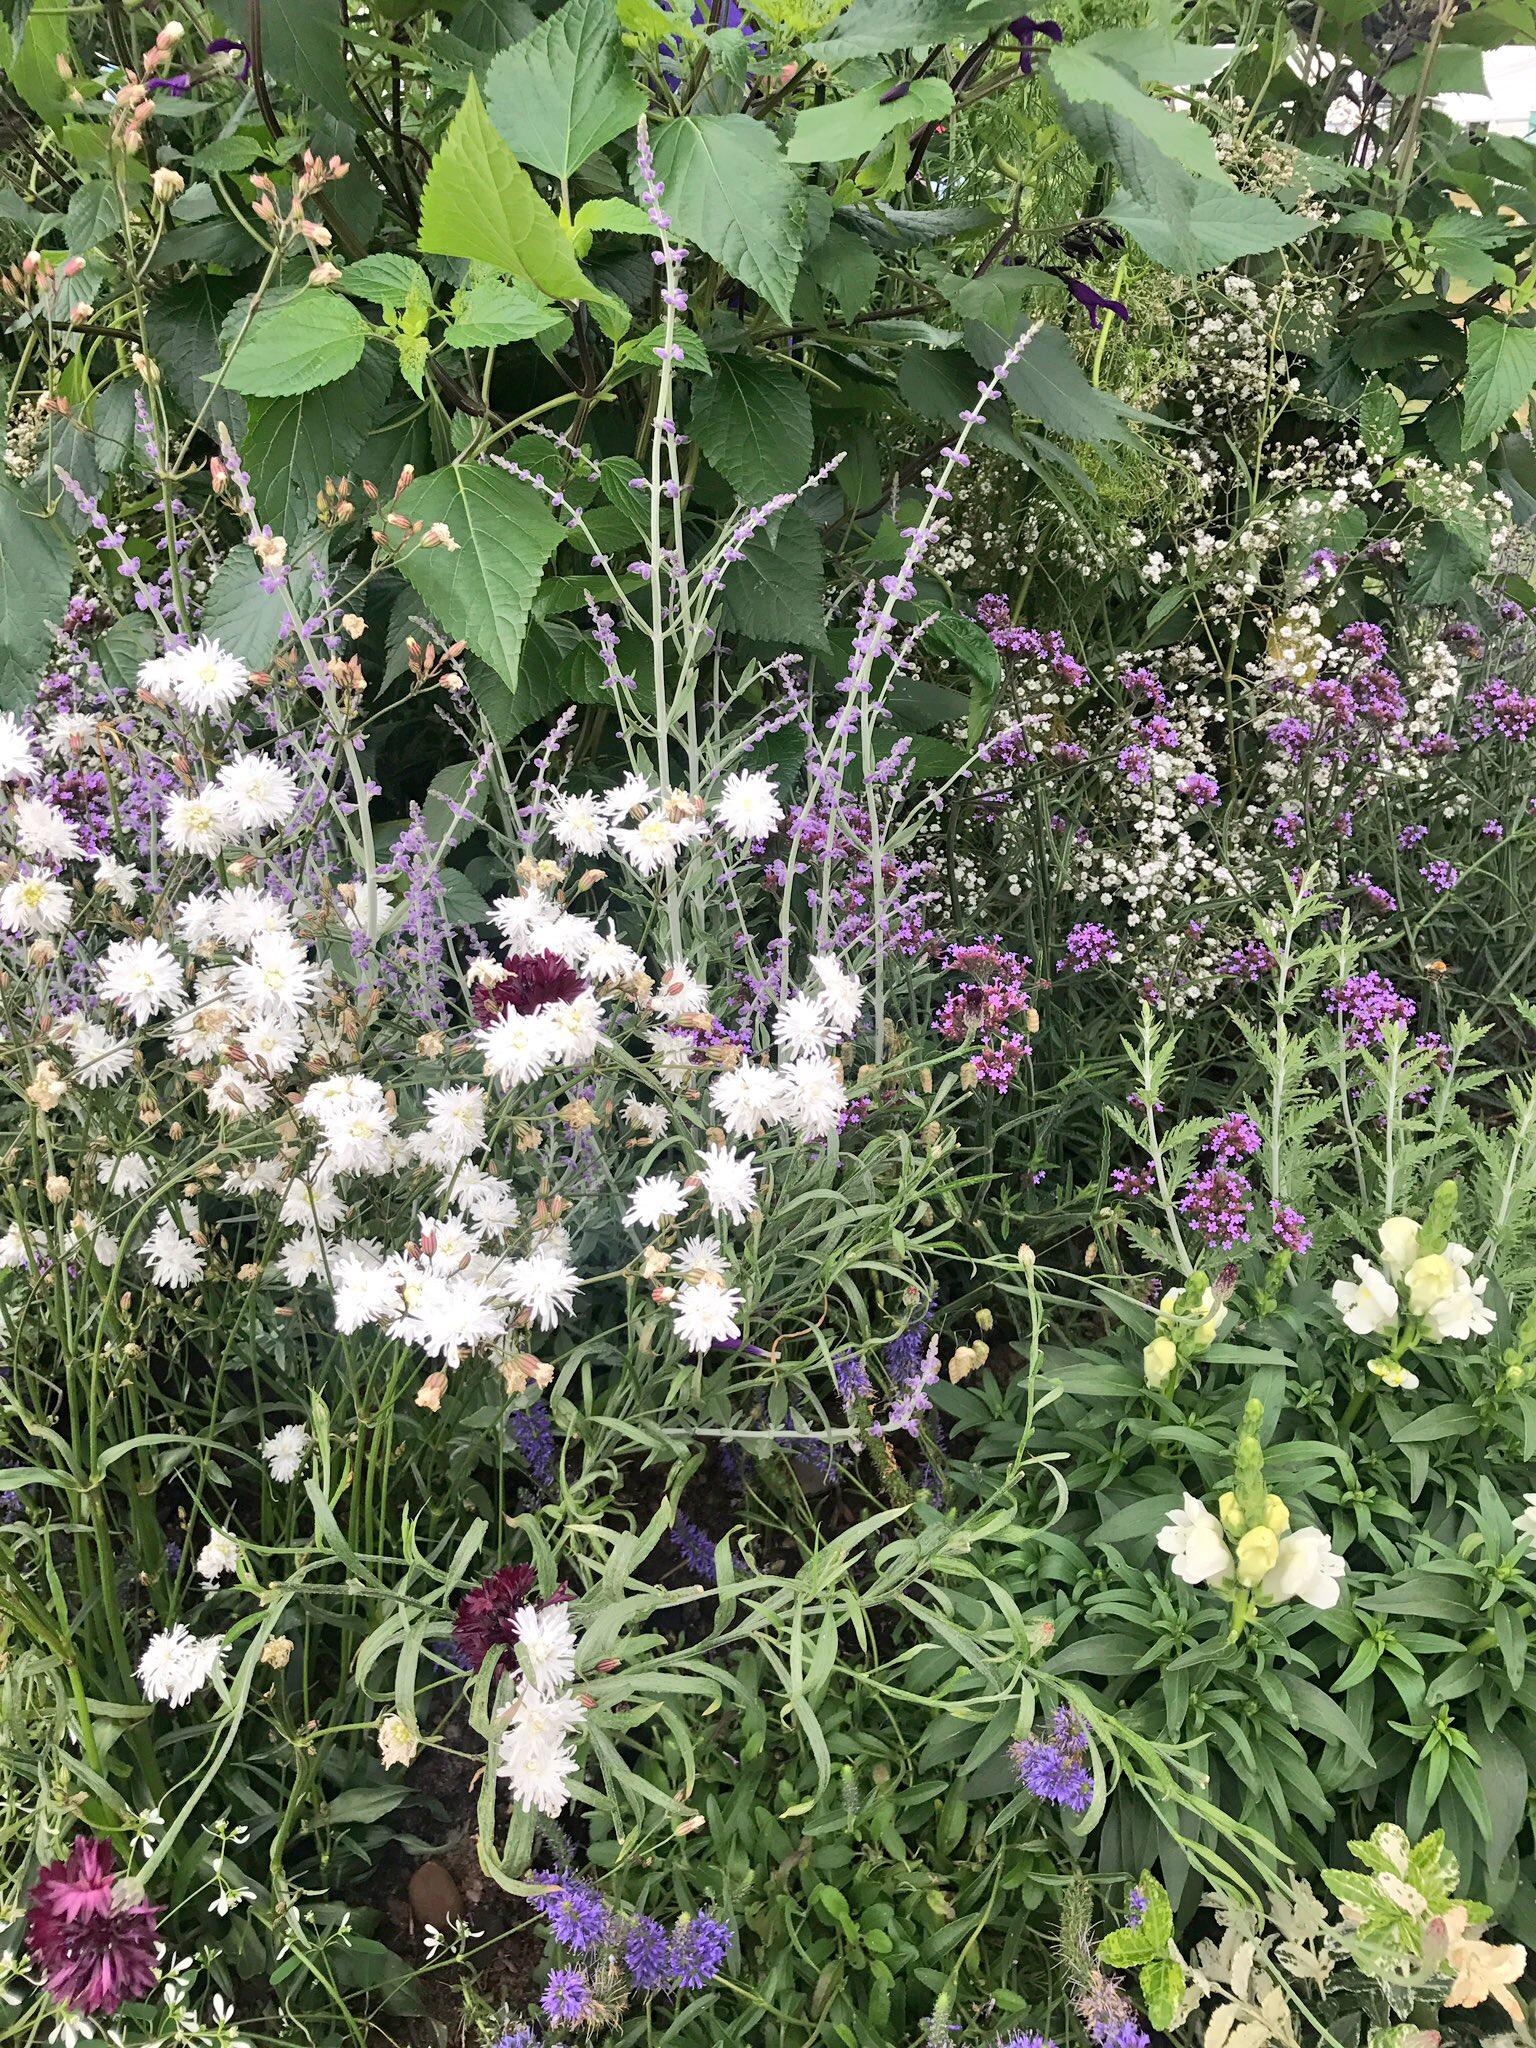 Lychnis 'Petit Henri' (fluffy white flowers)